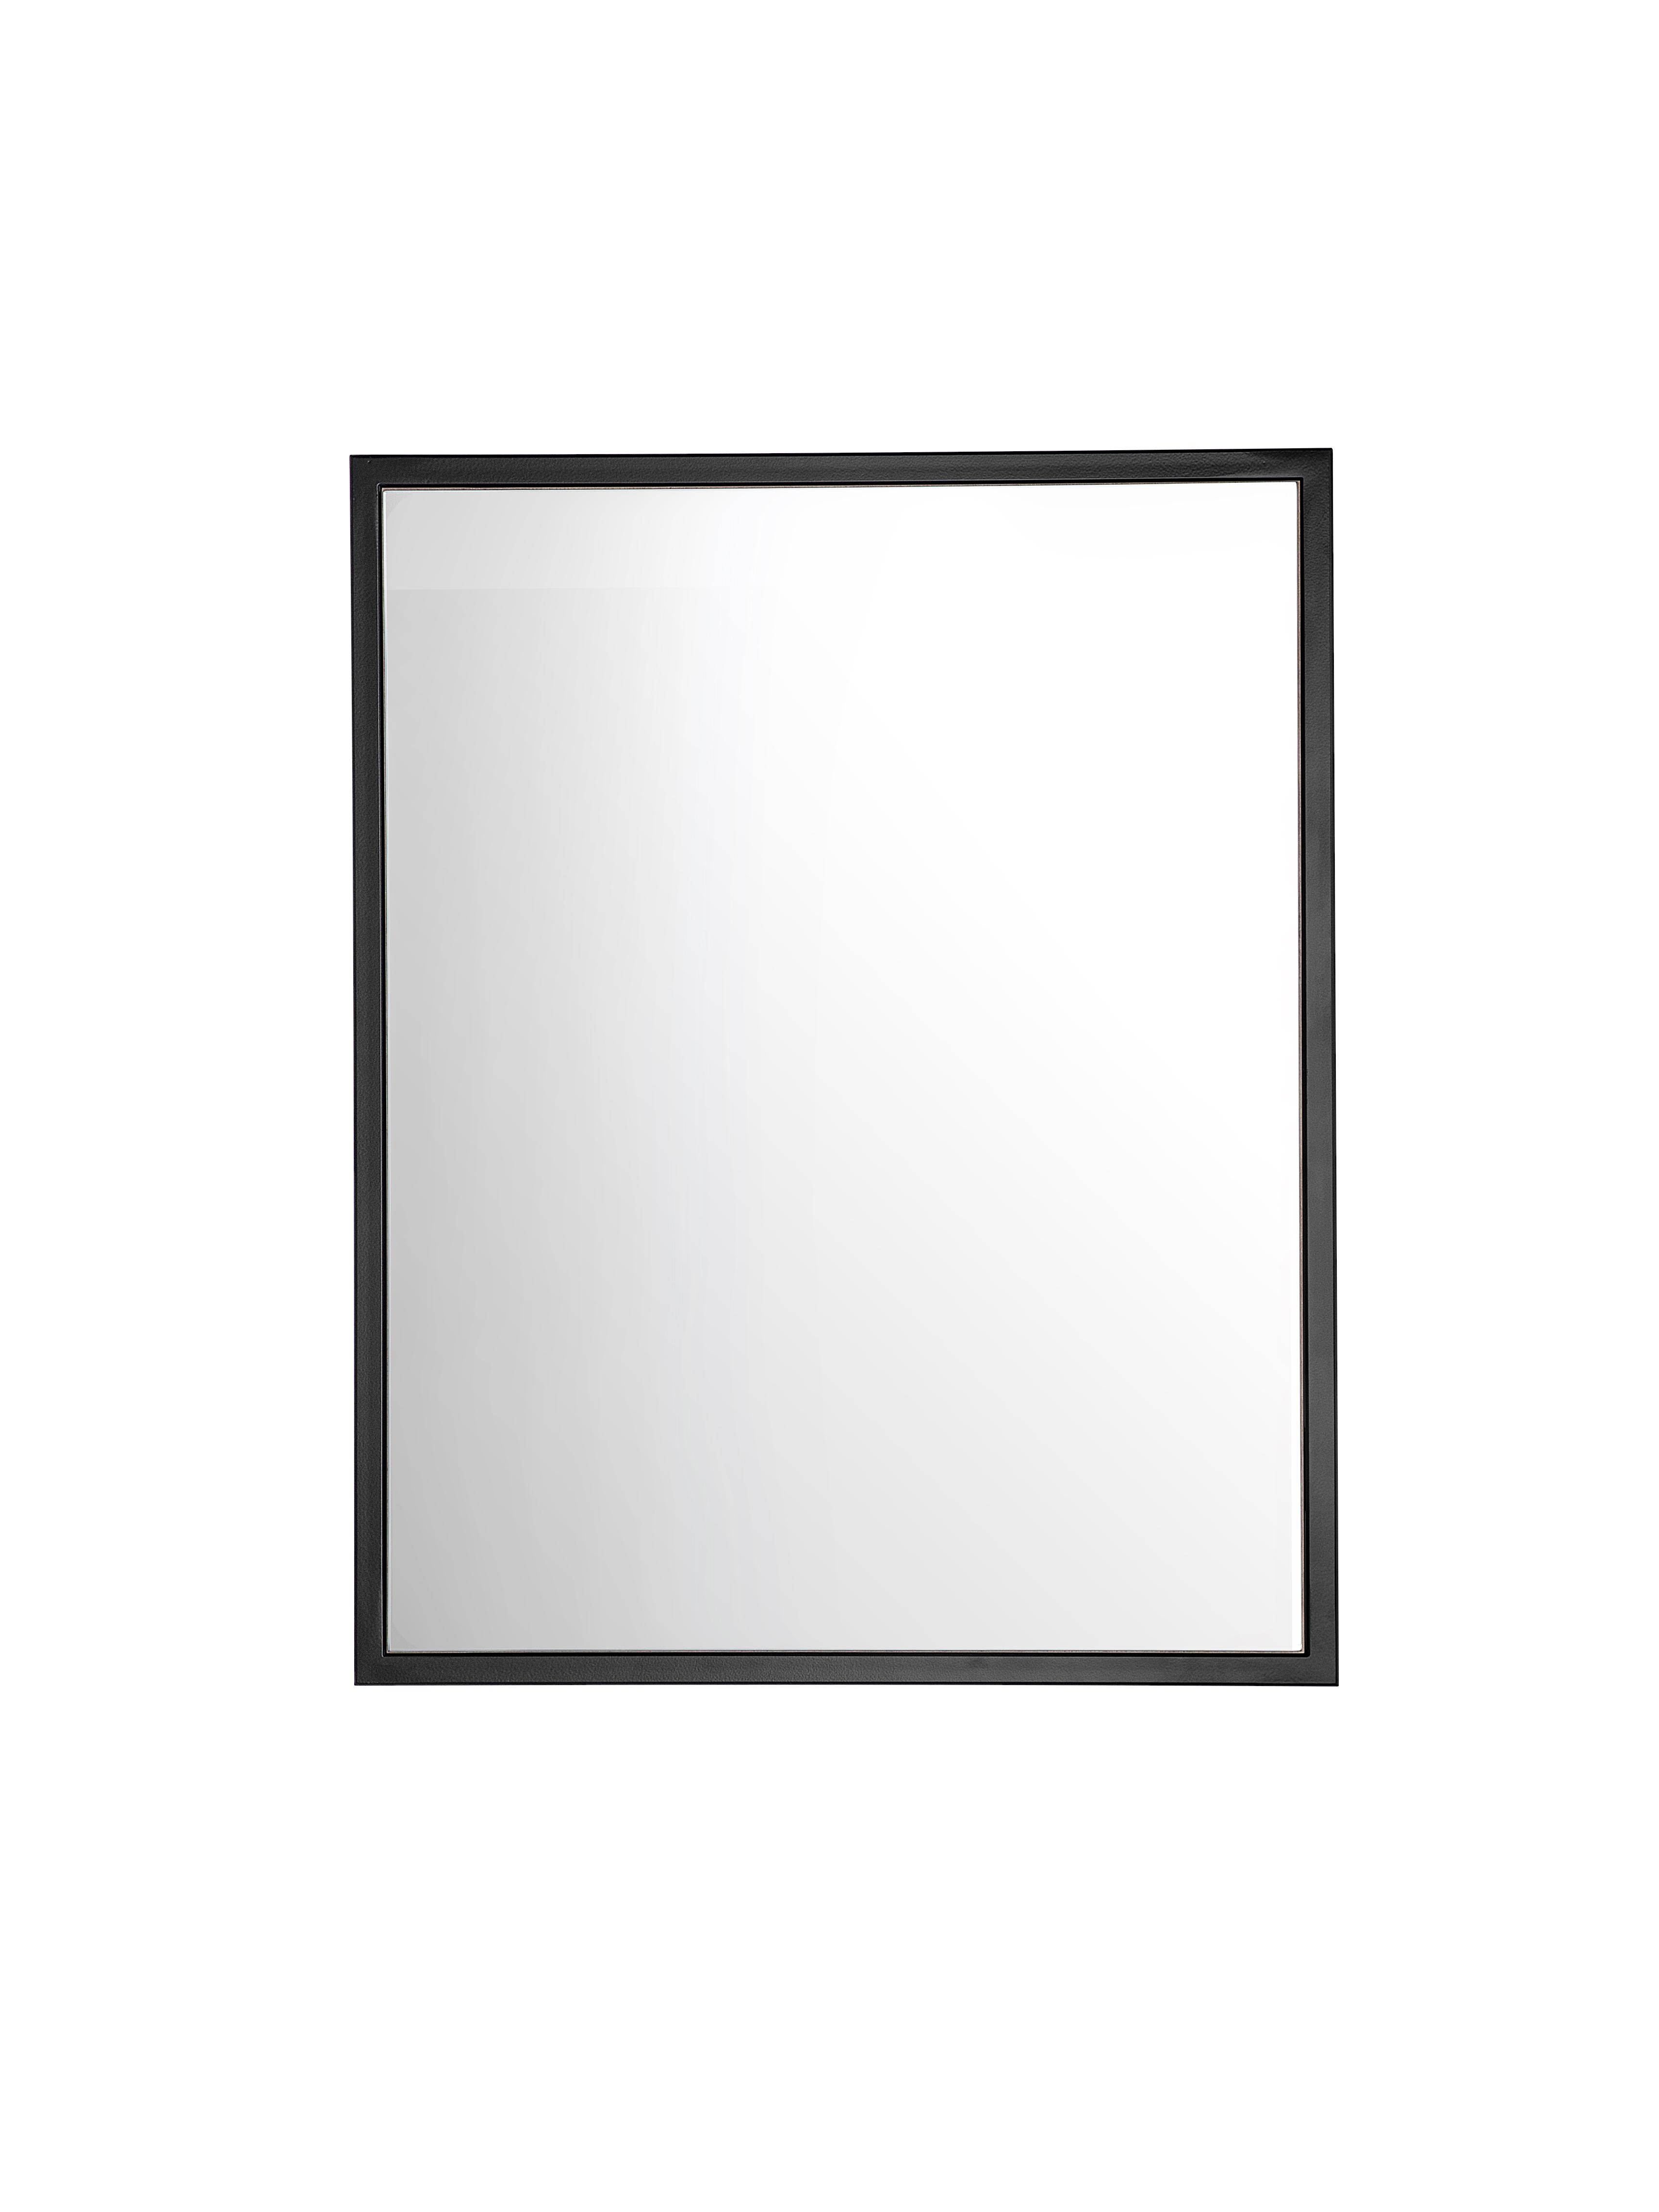 ArtCom Kúpeľňová zostava Manhattan Manhattan: Zrkadlo